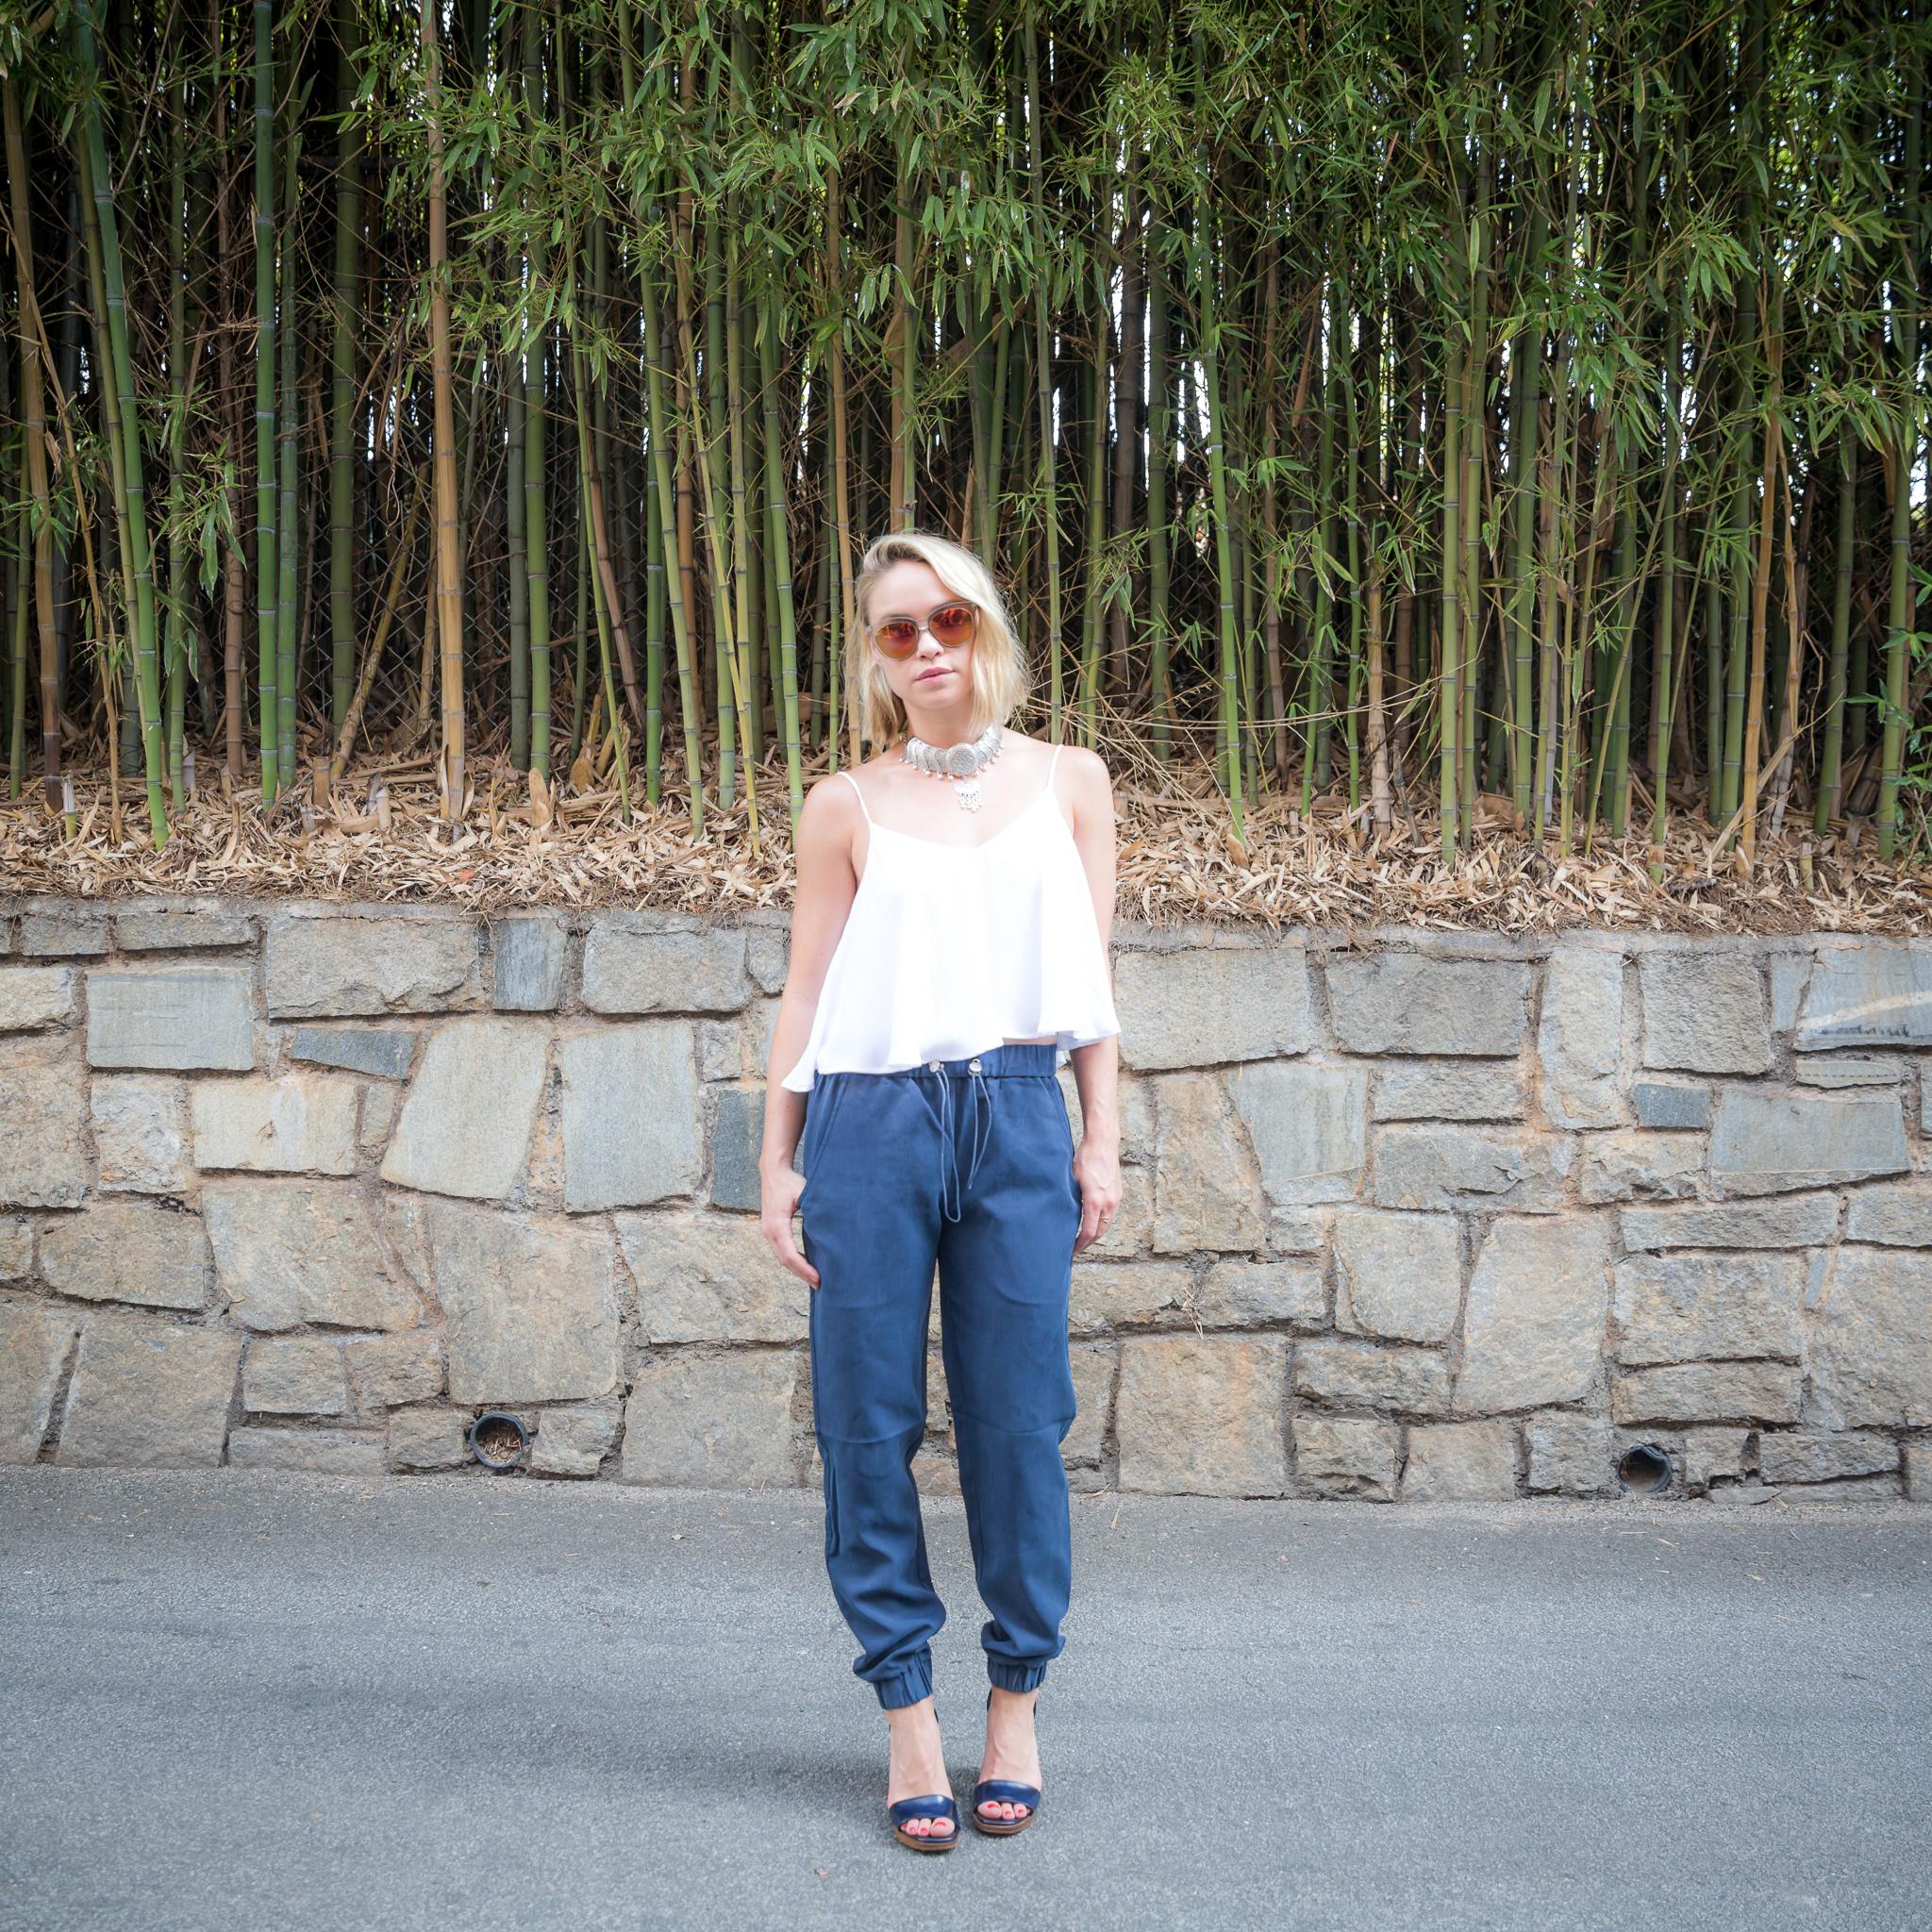 Becca-Tobin-iWally-July2015-6.jpg